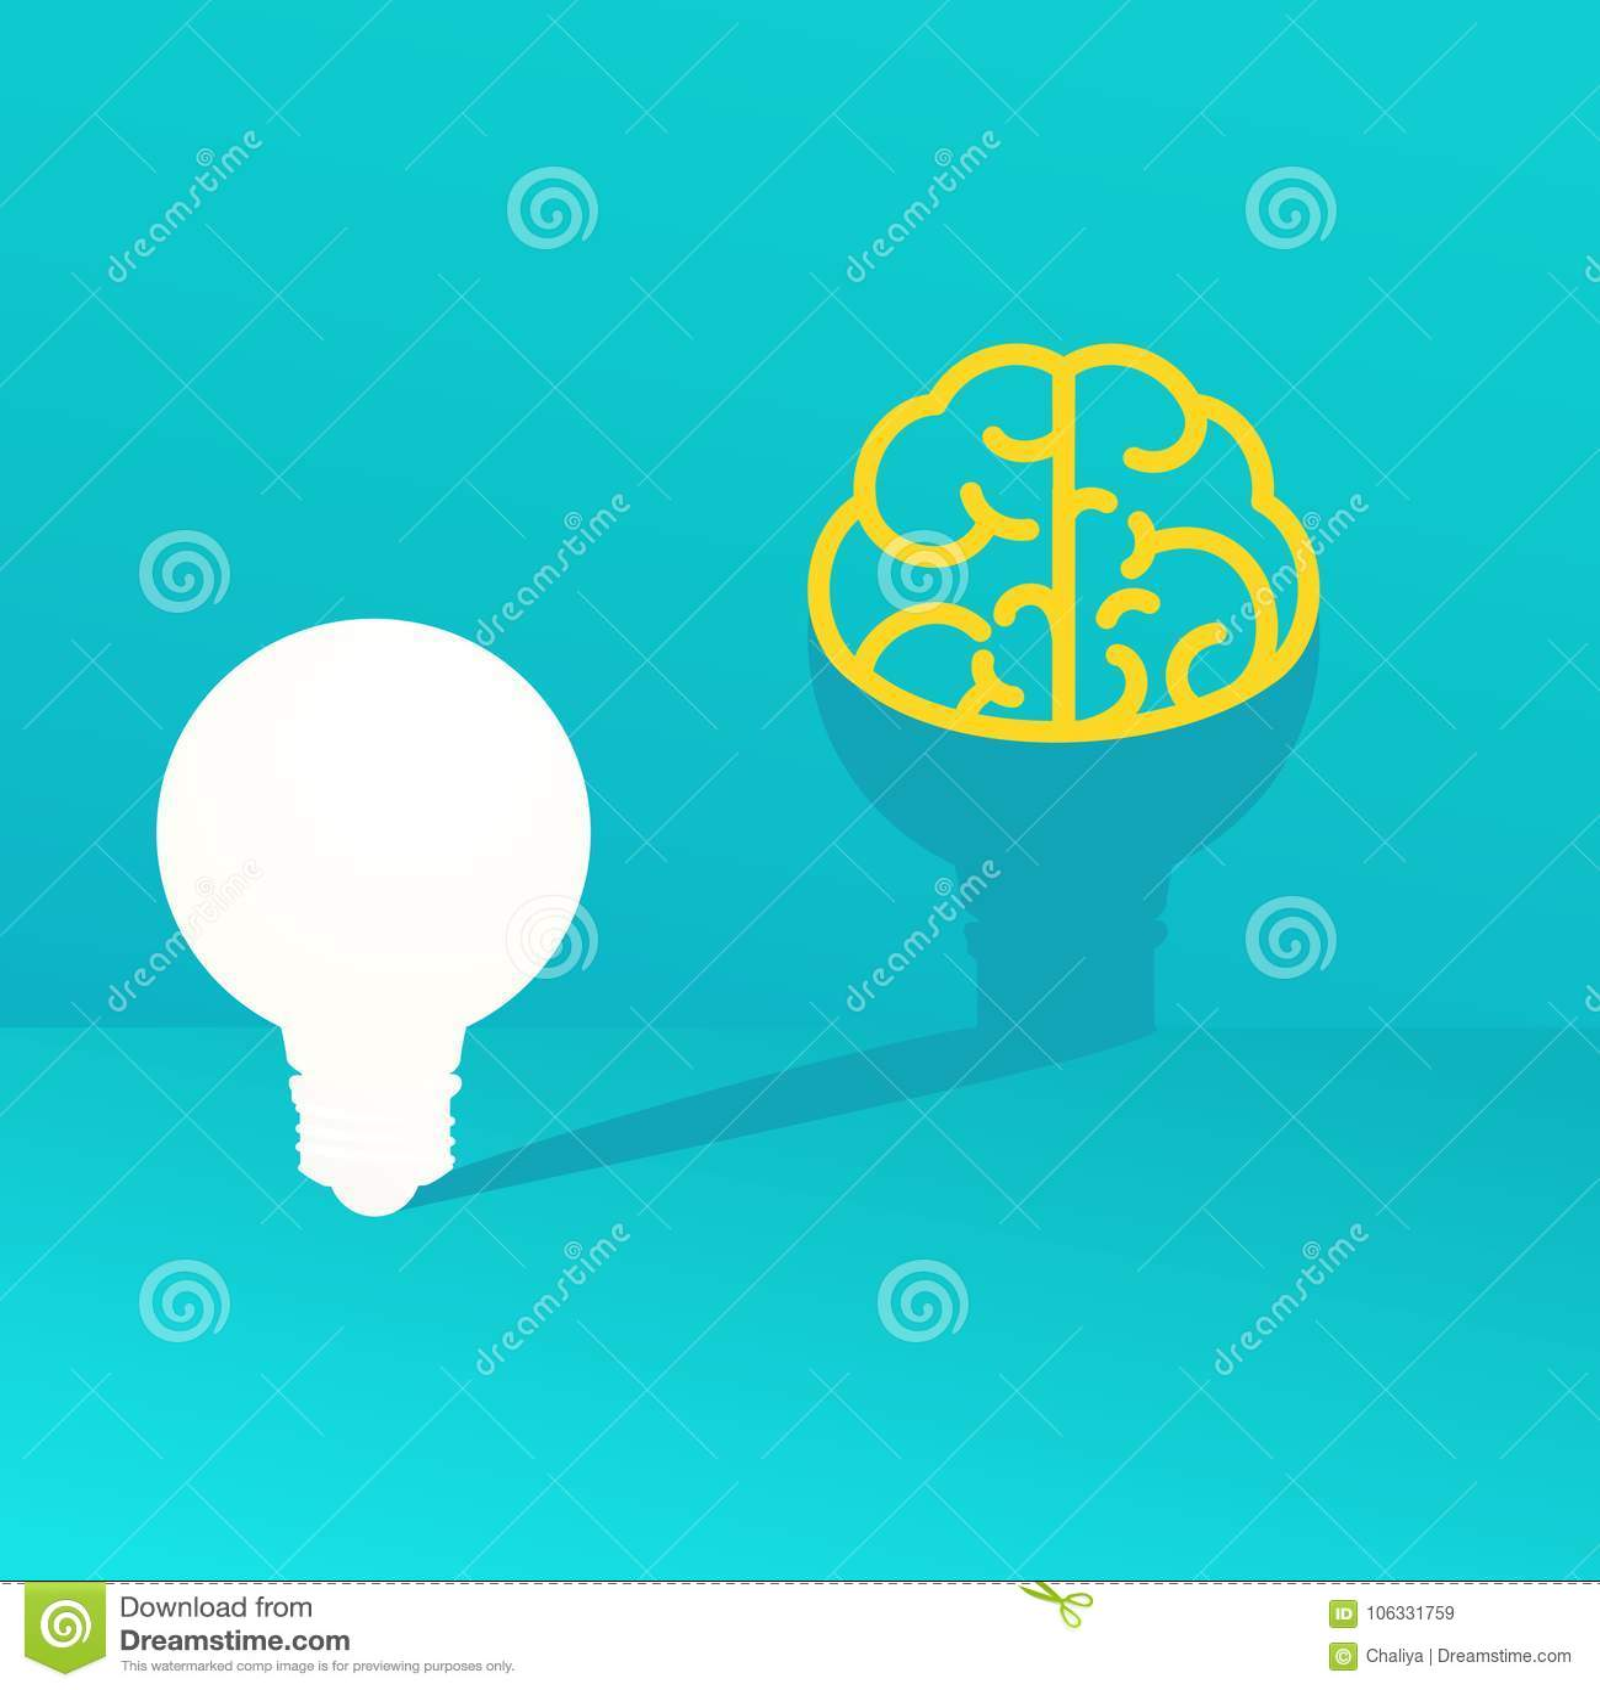 Light Bulb Idea Concept Light Bulb Casts A Shadow In The Form Of Brain On Wall Stock Vector